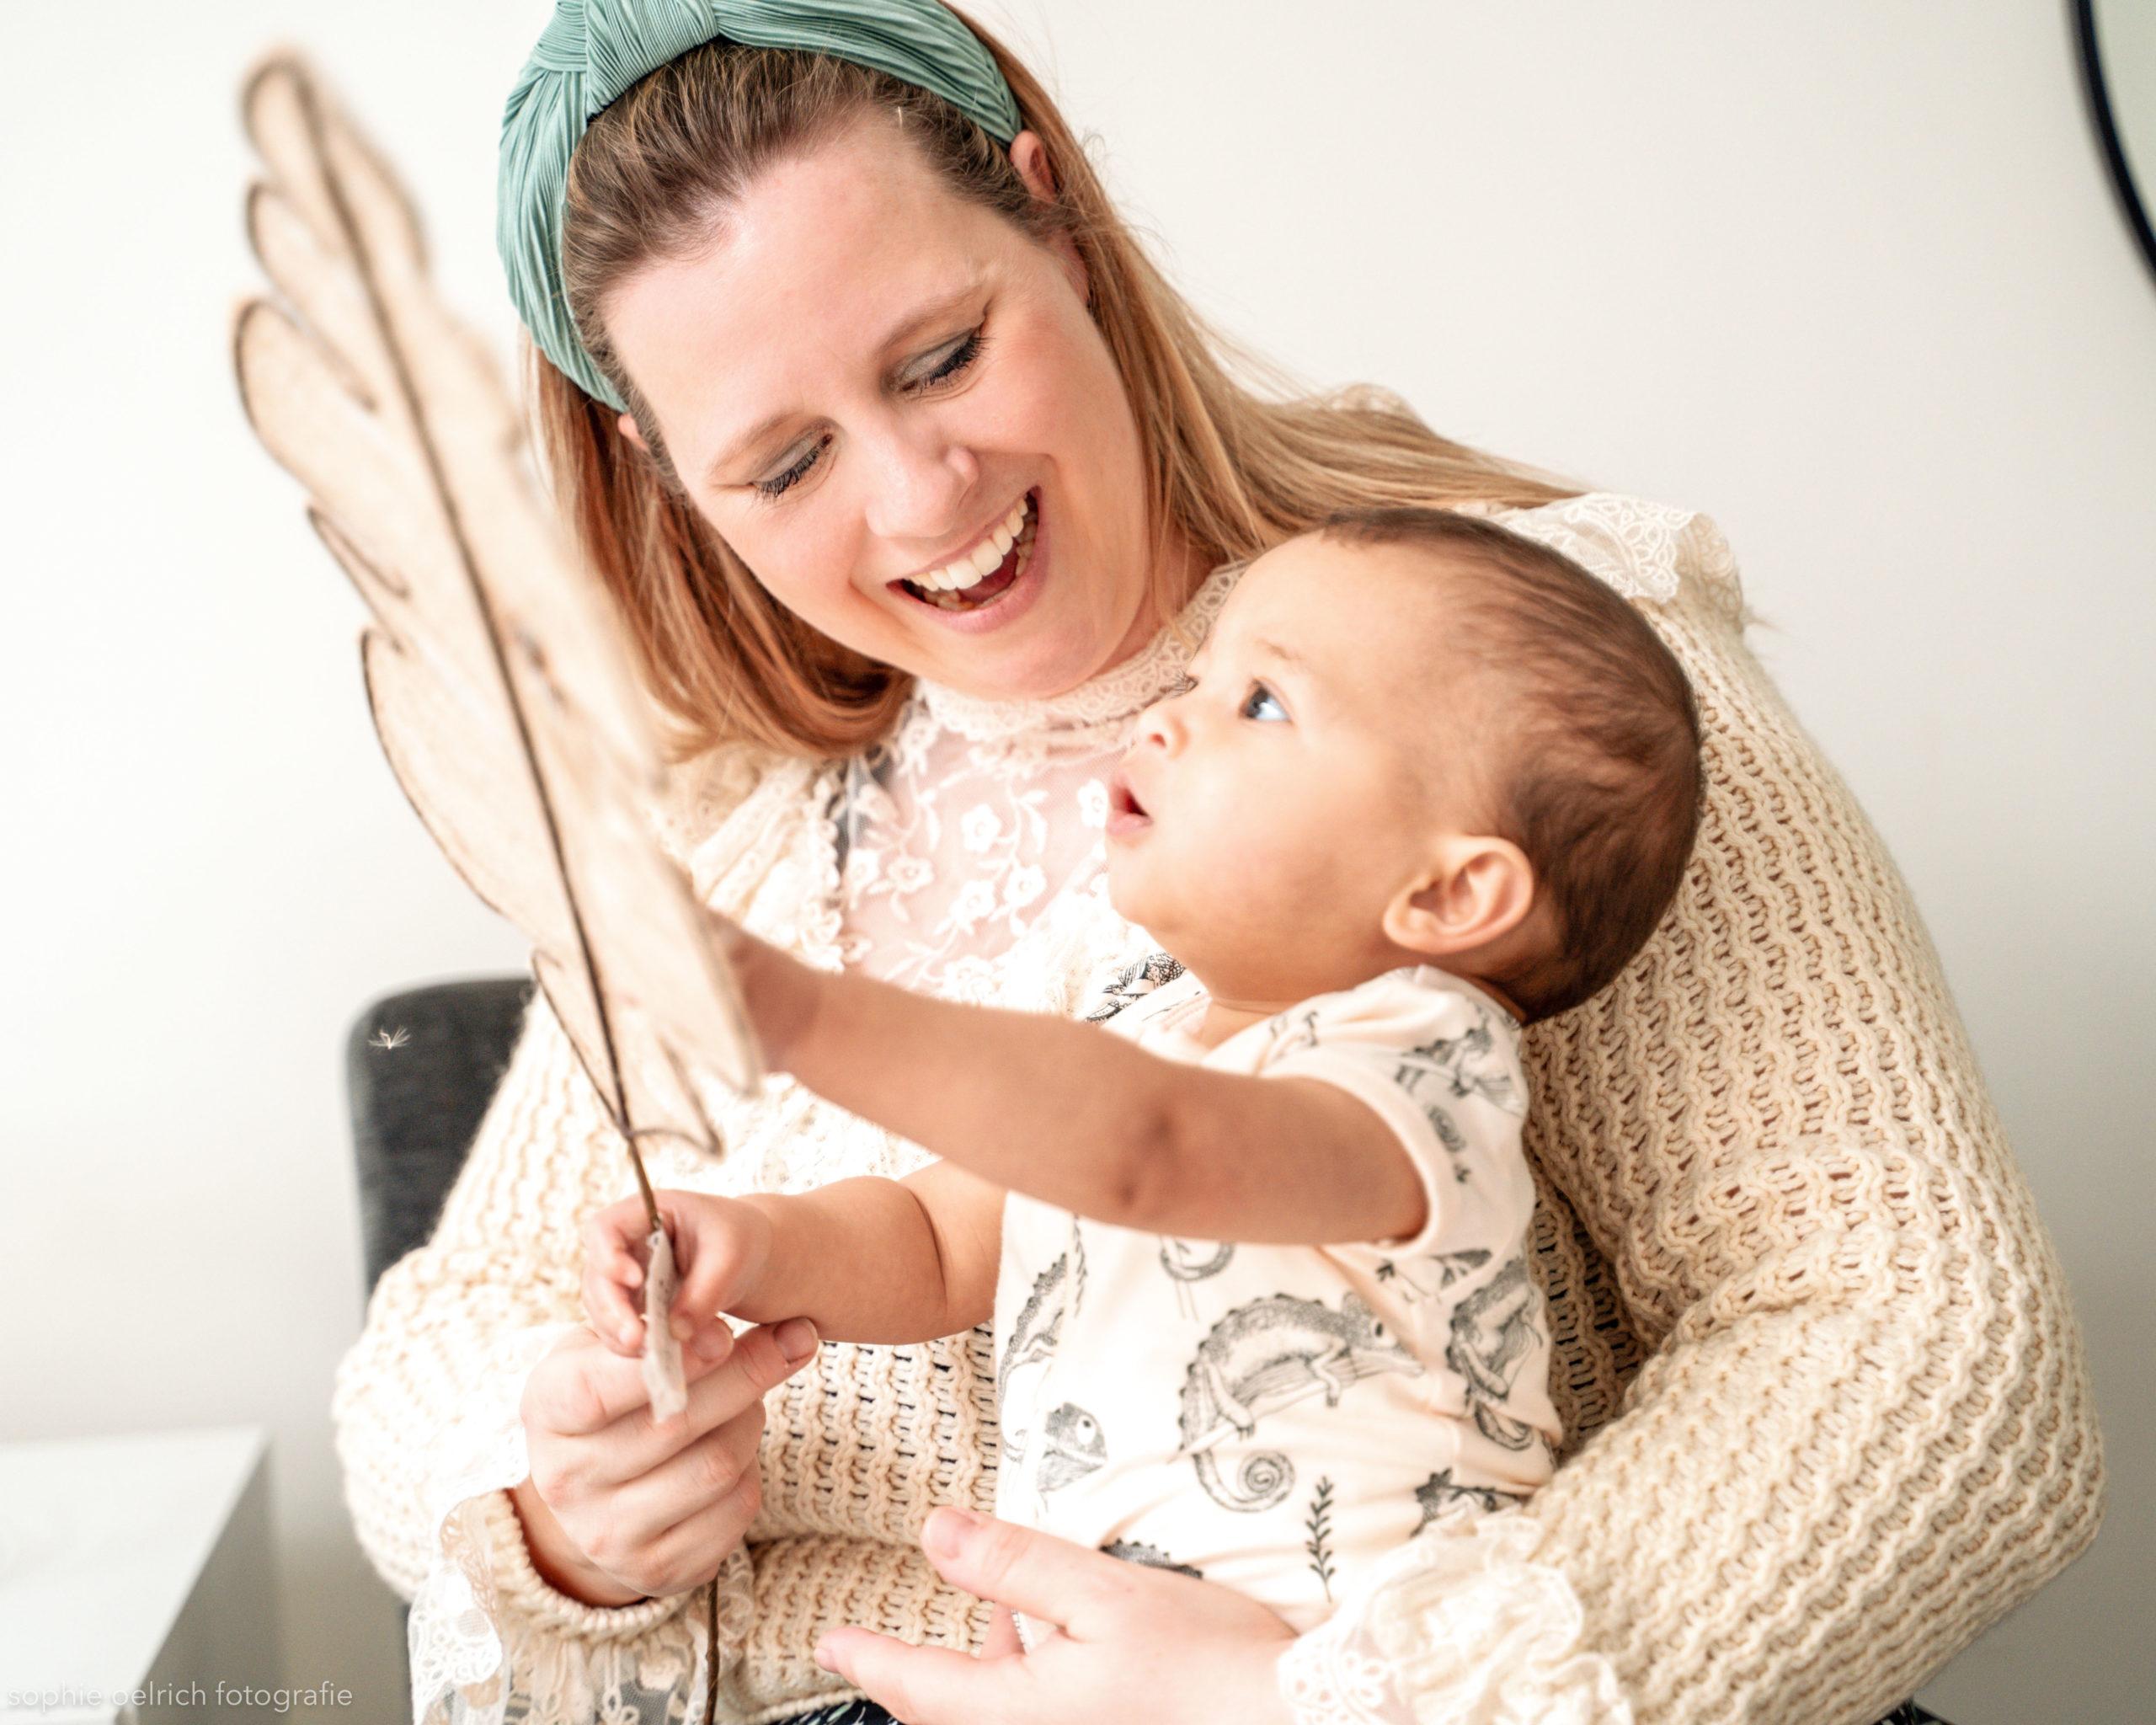 wilson & Frenchie bij Kinderfavorites, prachtige babykleding